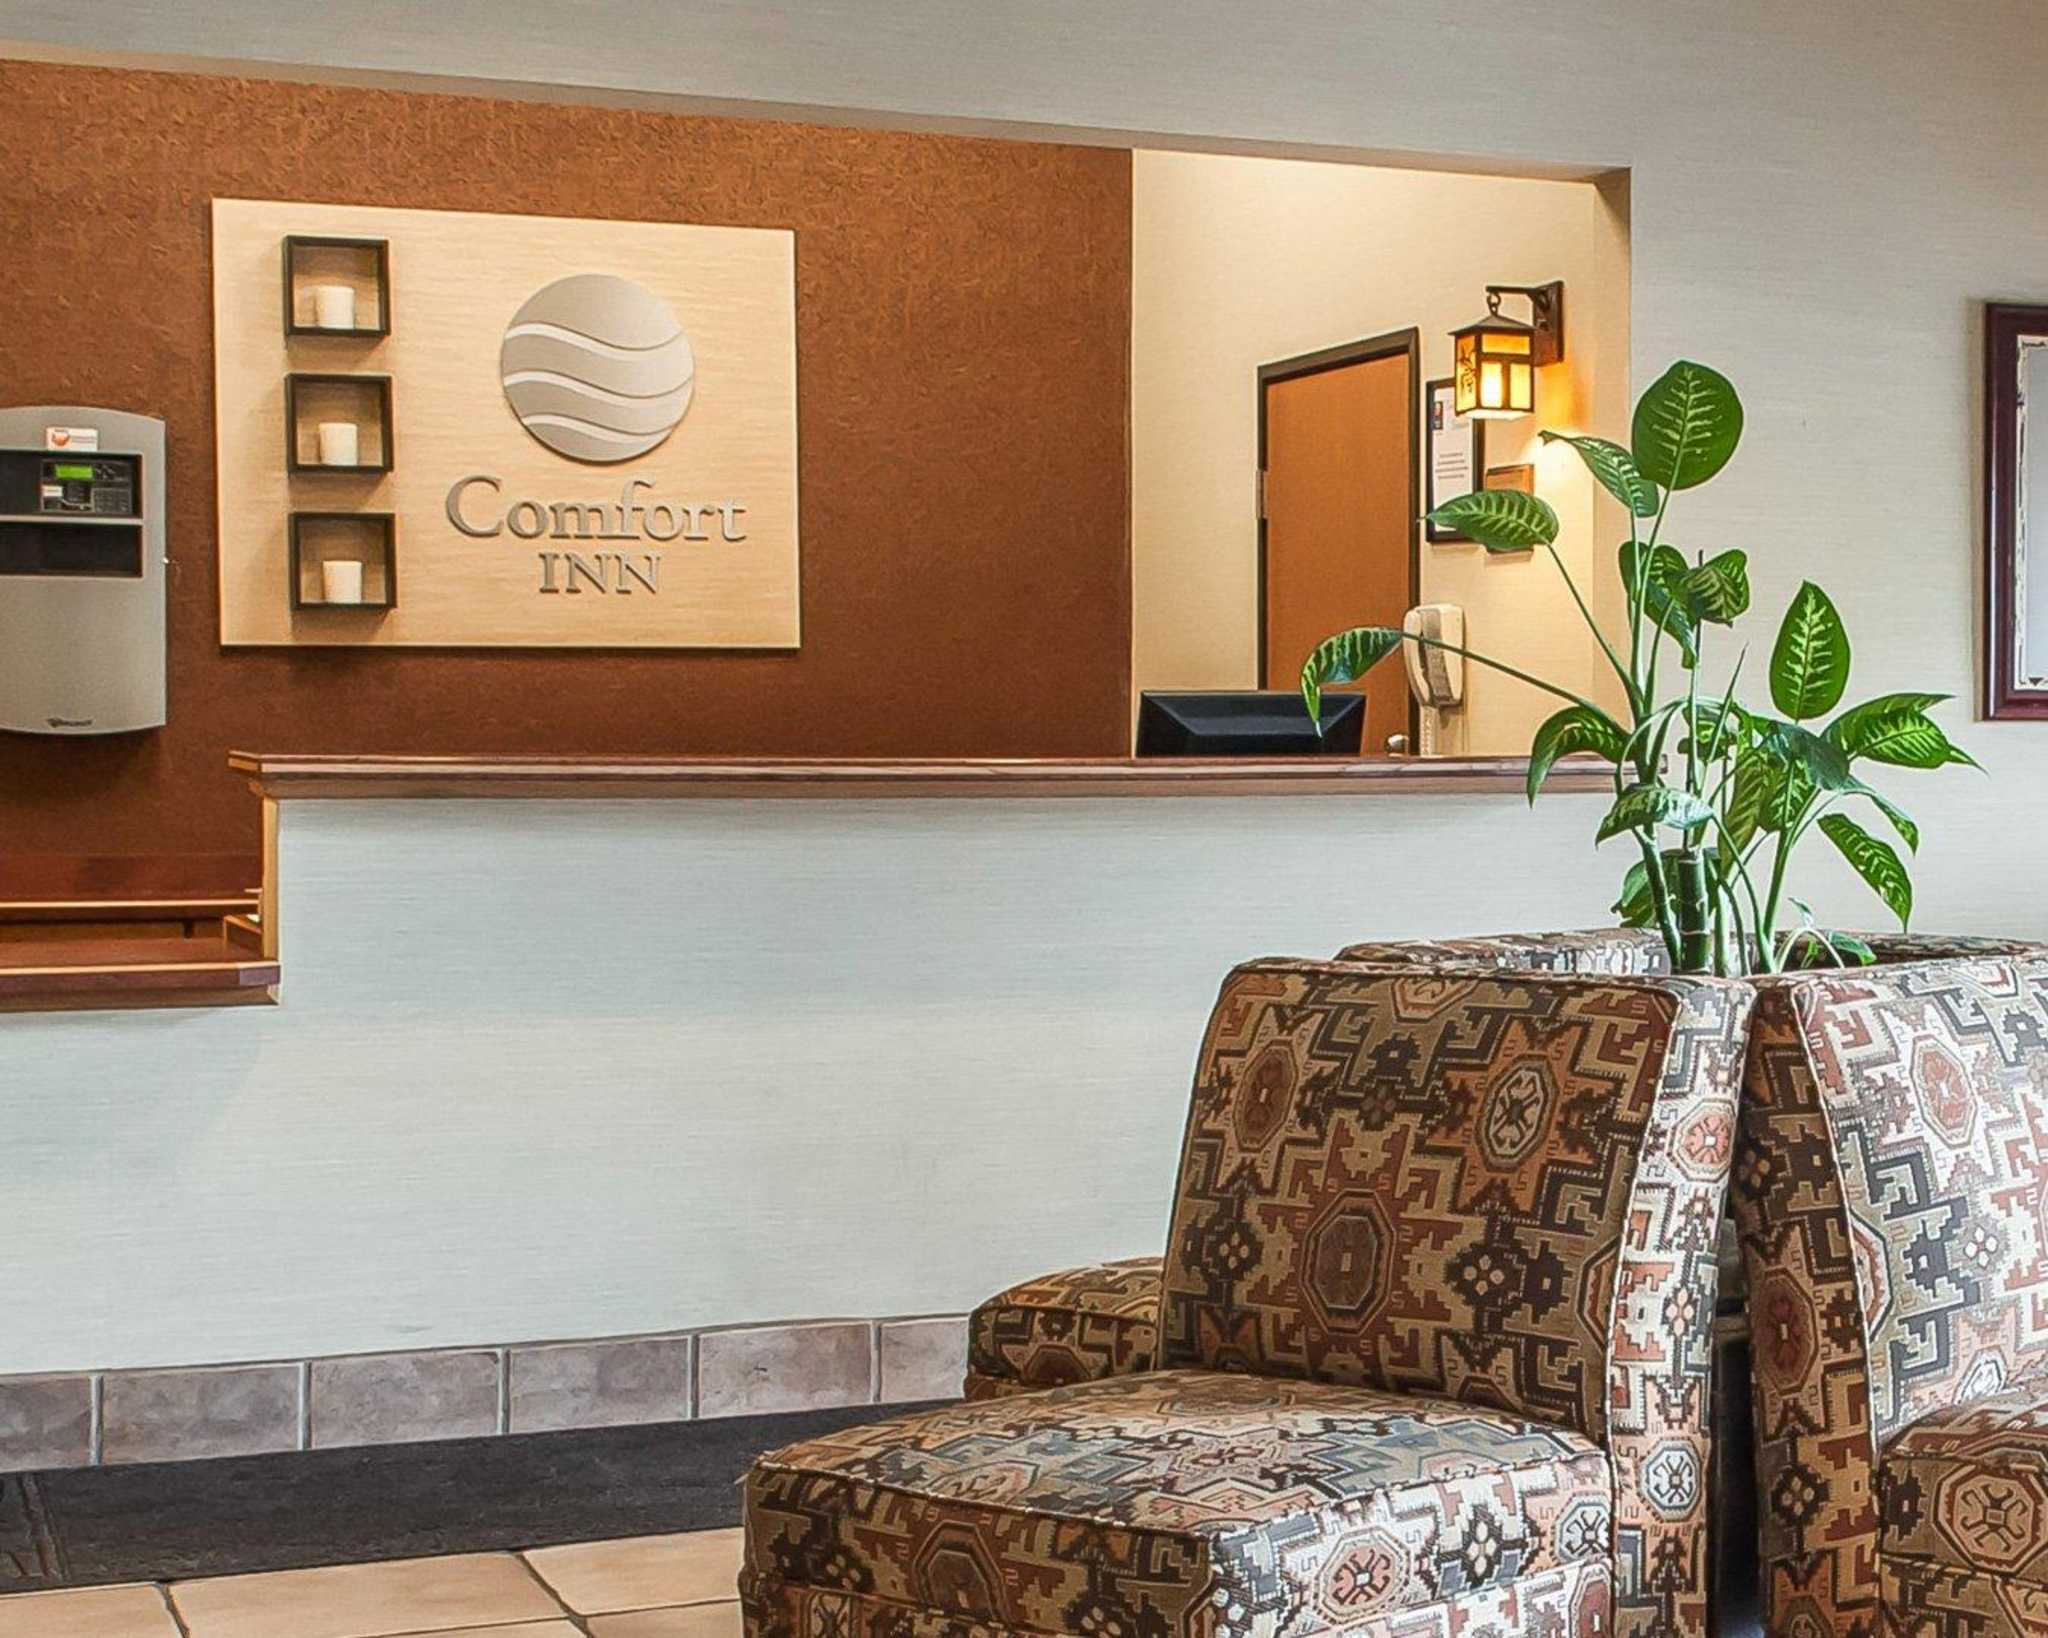 Comfort Inn Midtown image 14